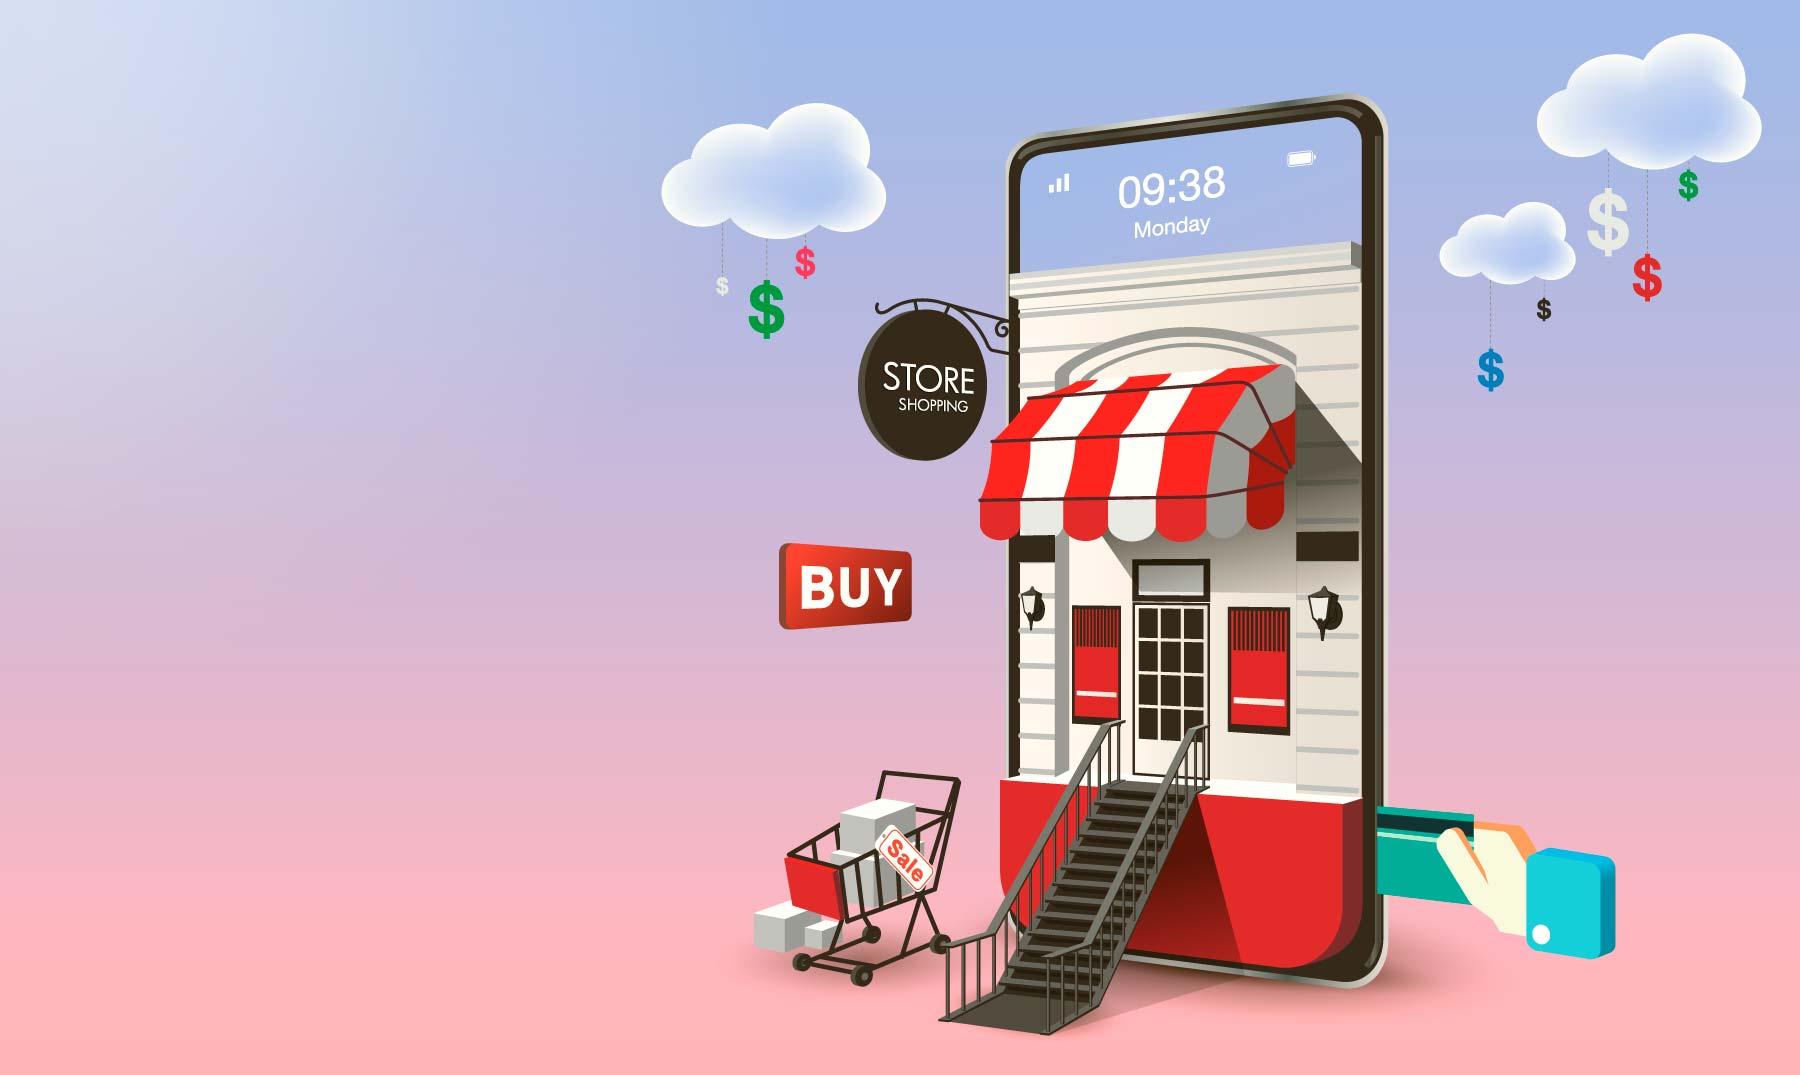 monta-tu-propia-tienda-online